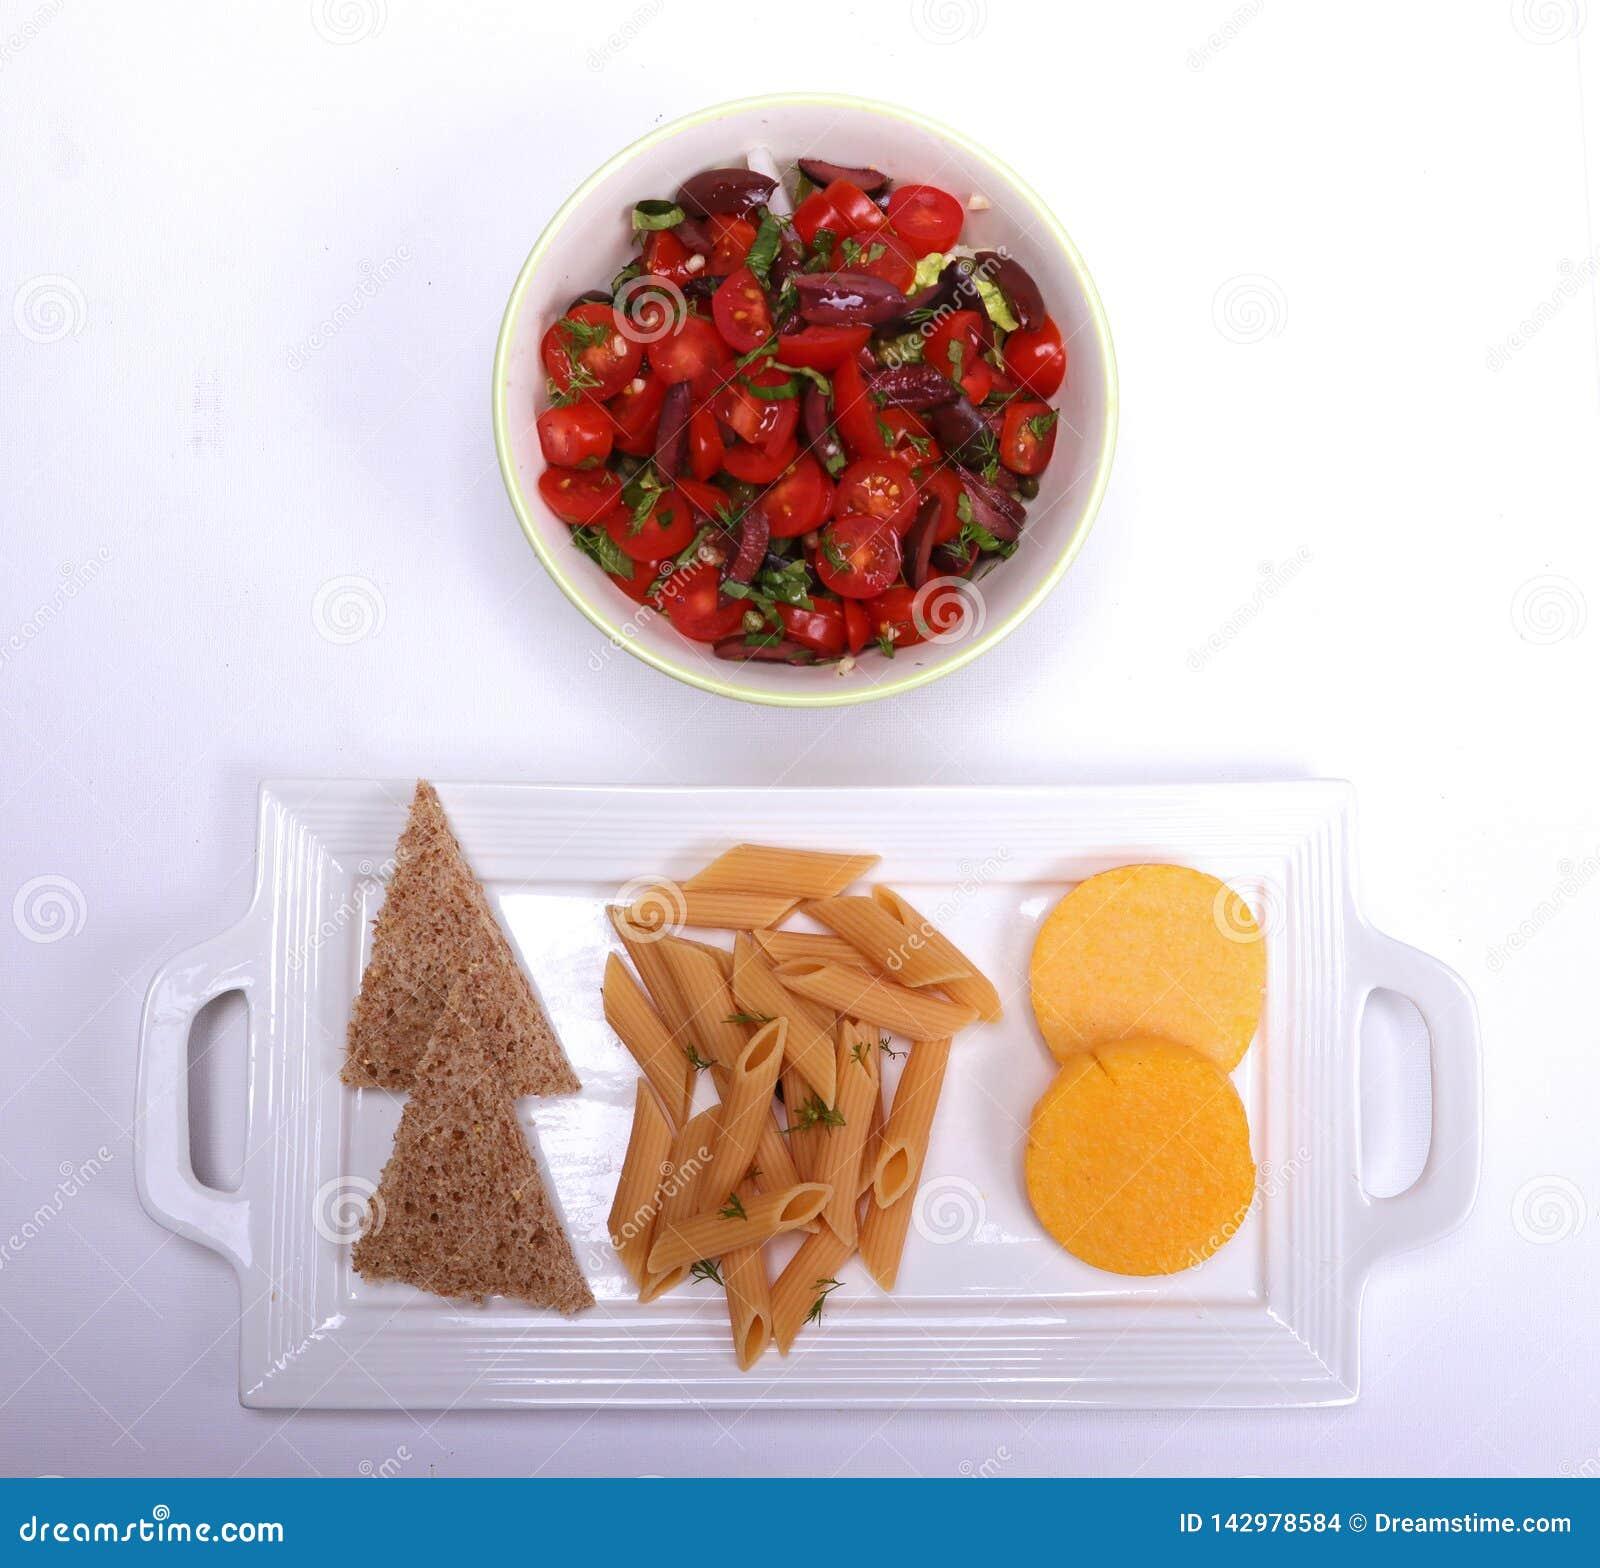 Plan des strengen Vegetariers der gesunden Ernährung